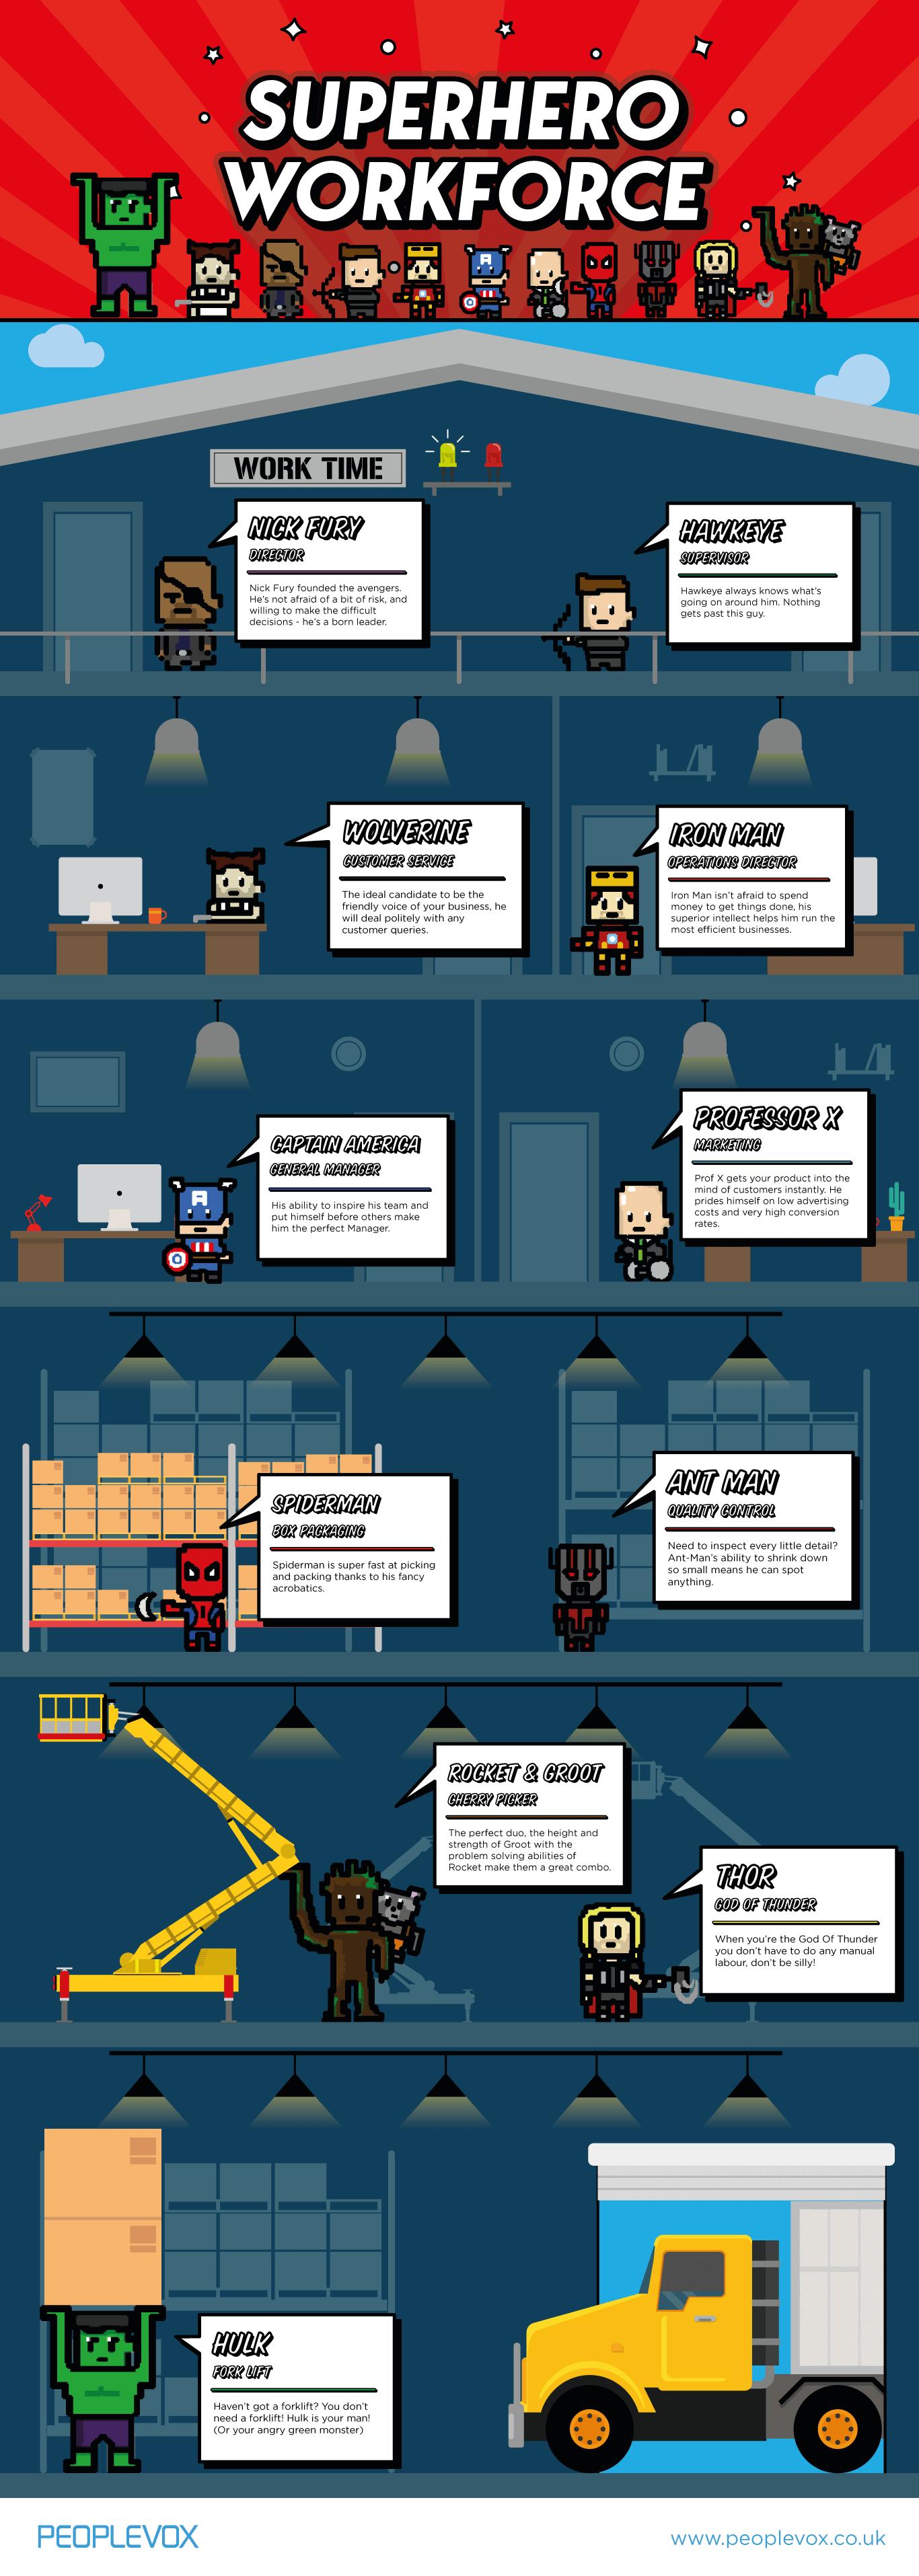 If superheroes